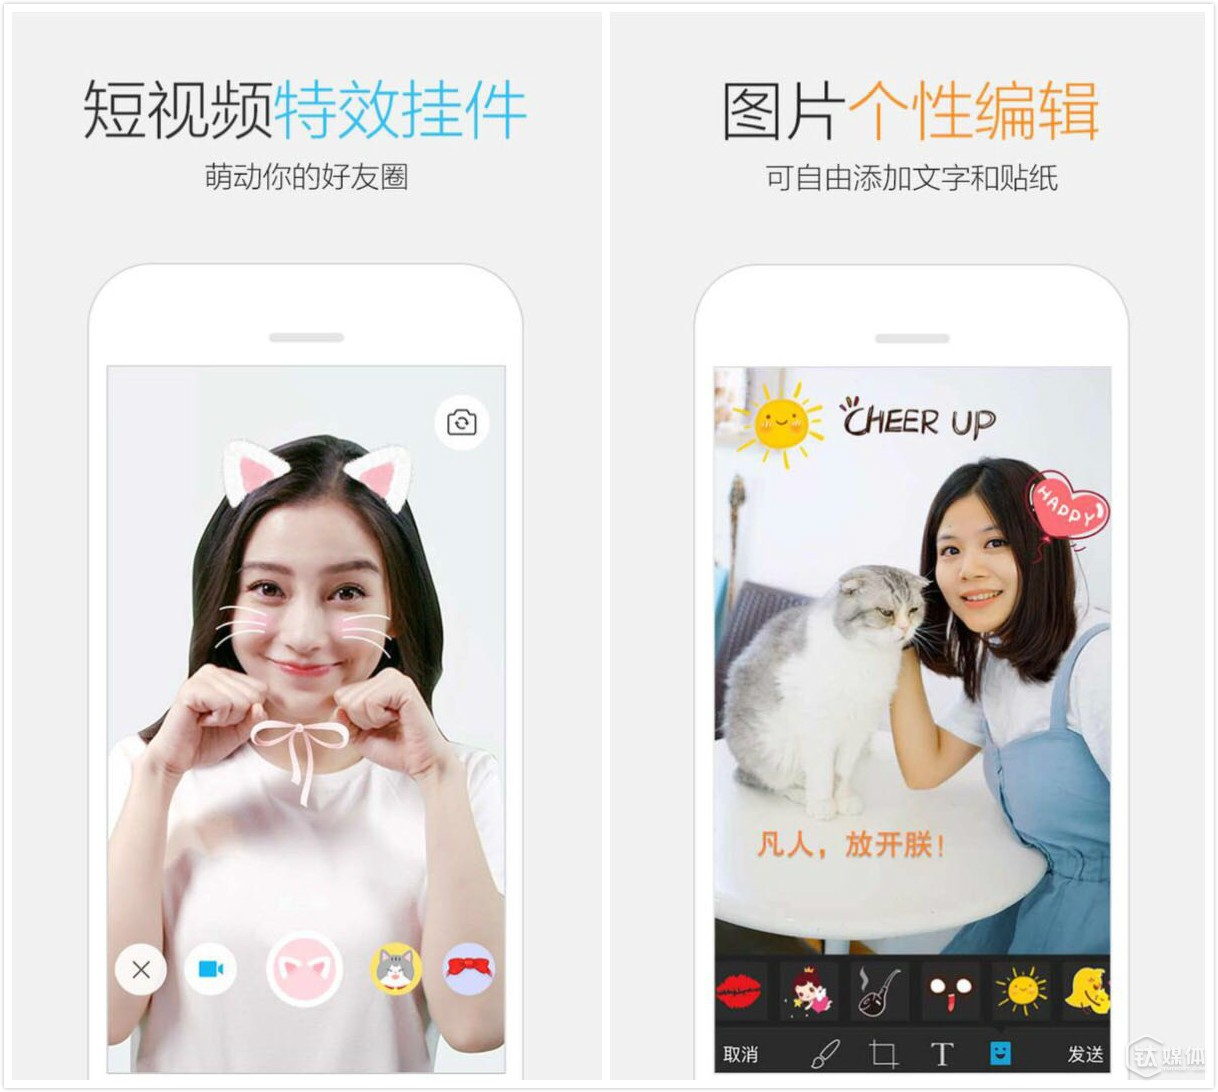 QQ在短视频和图片聊天方面比微信多了太多玩法